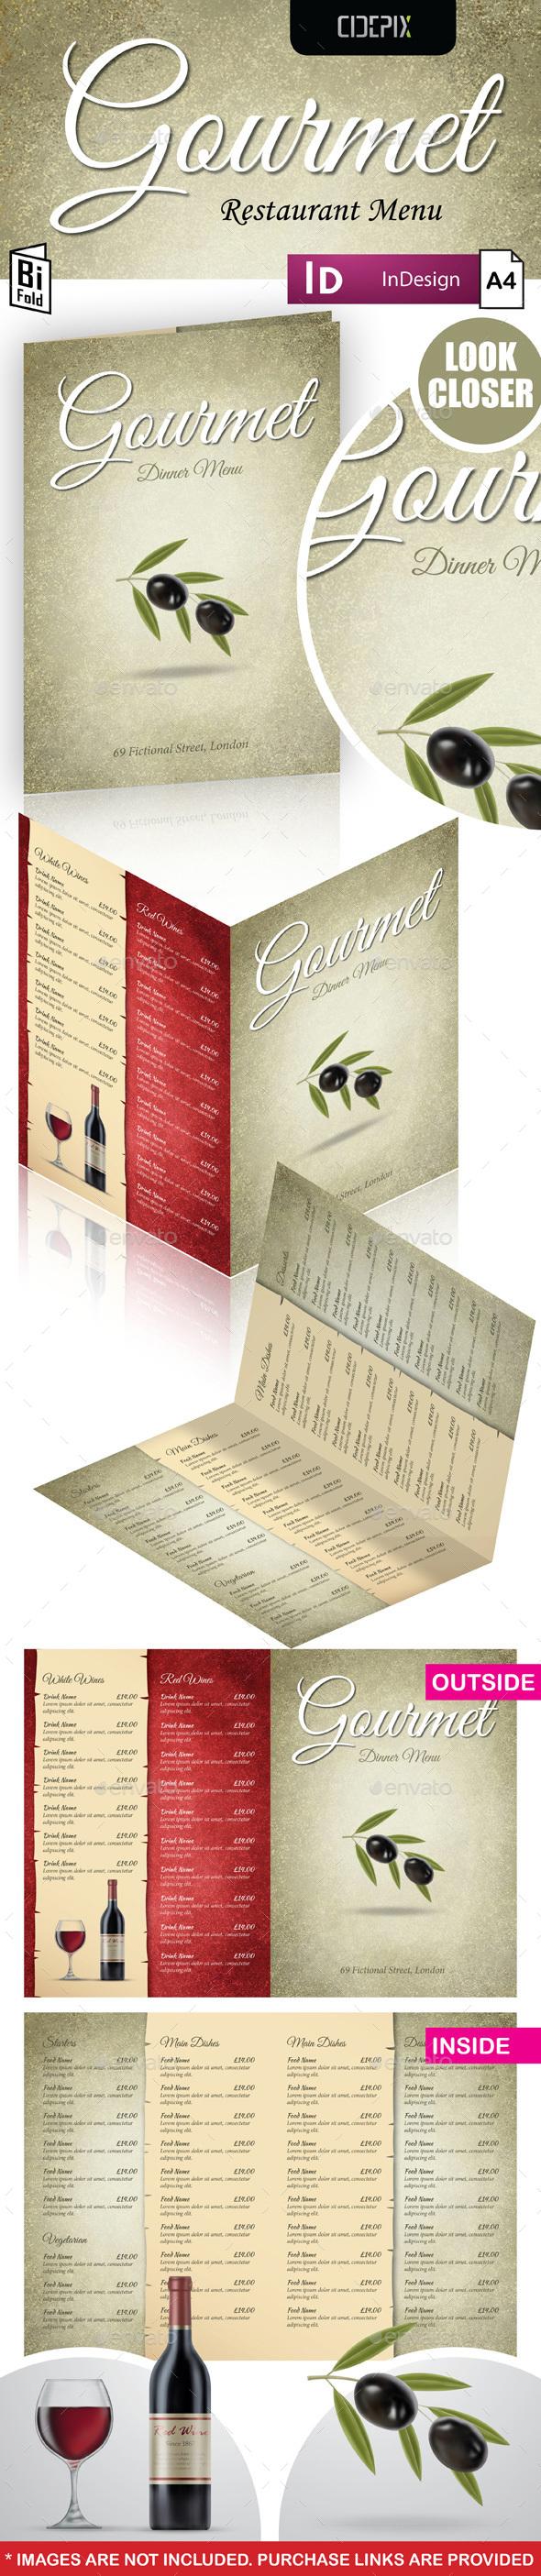 A4 Bifold Restaurant Menu Template - Food Menus Print Templates